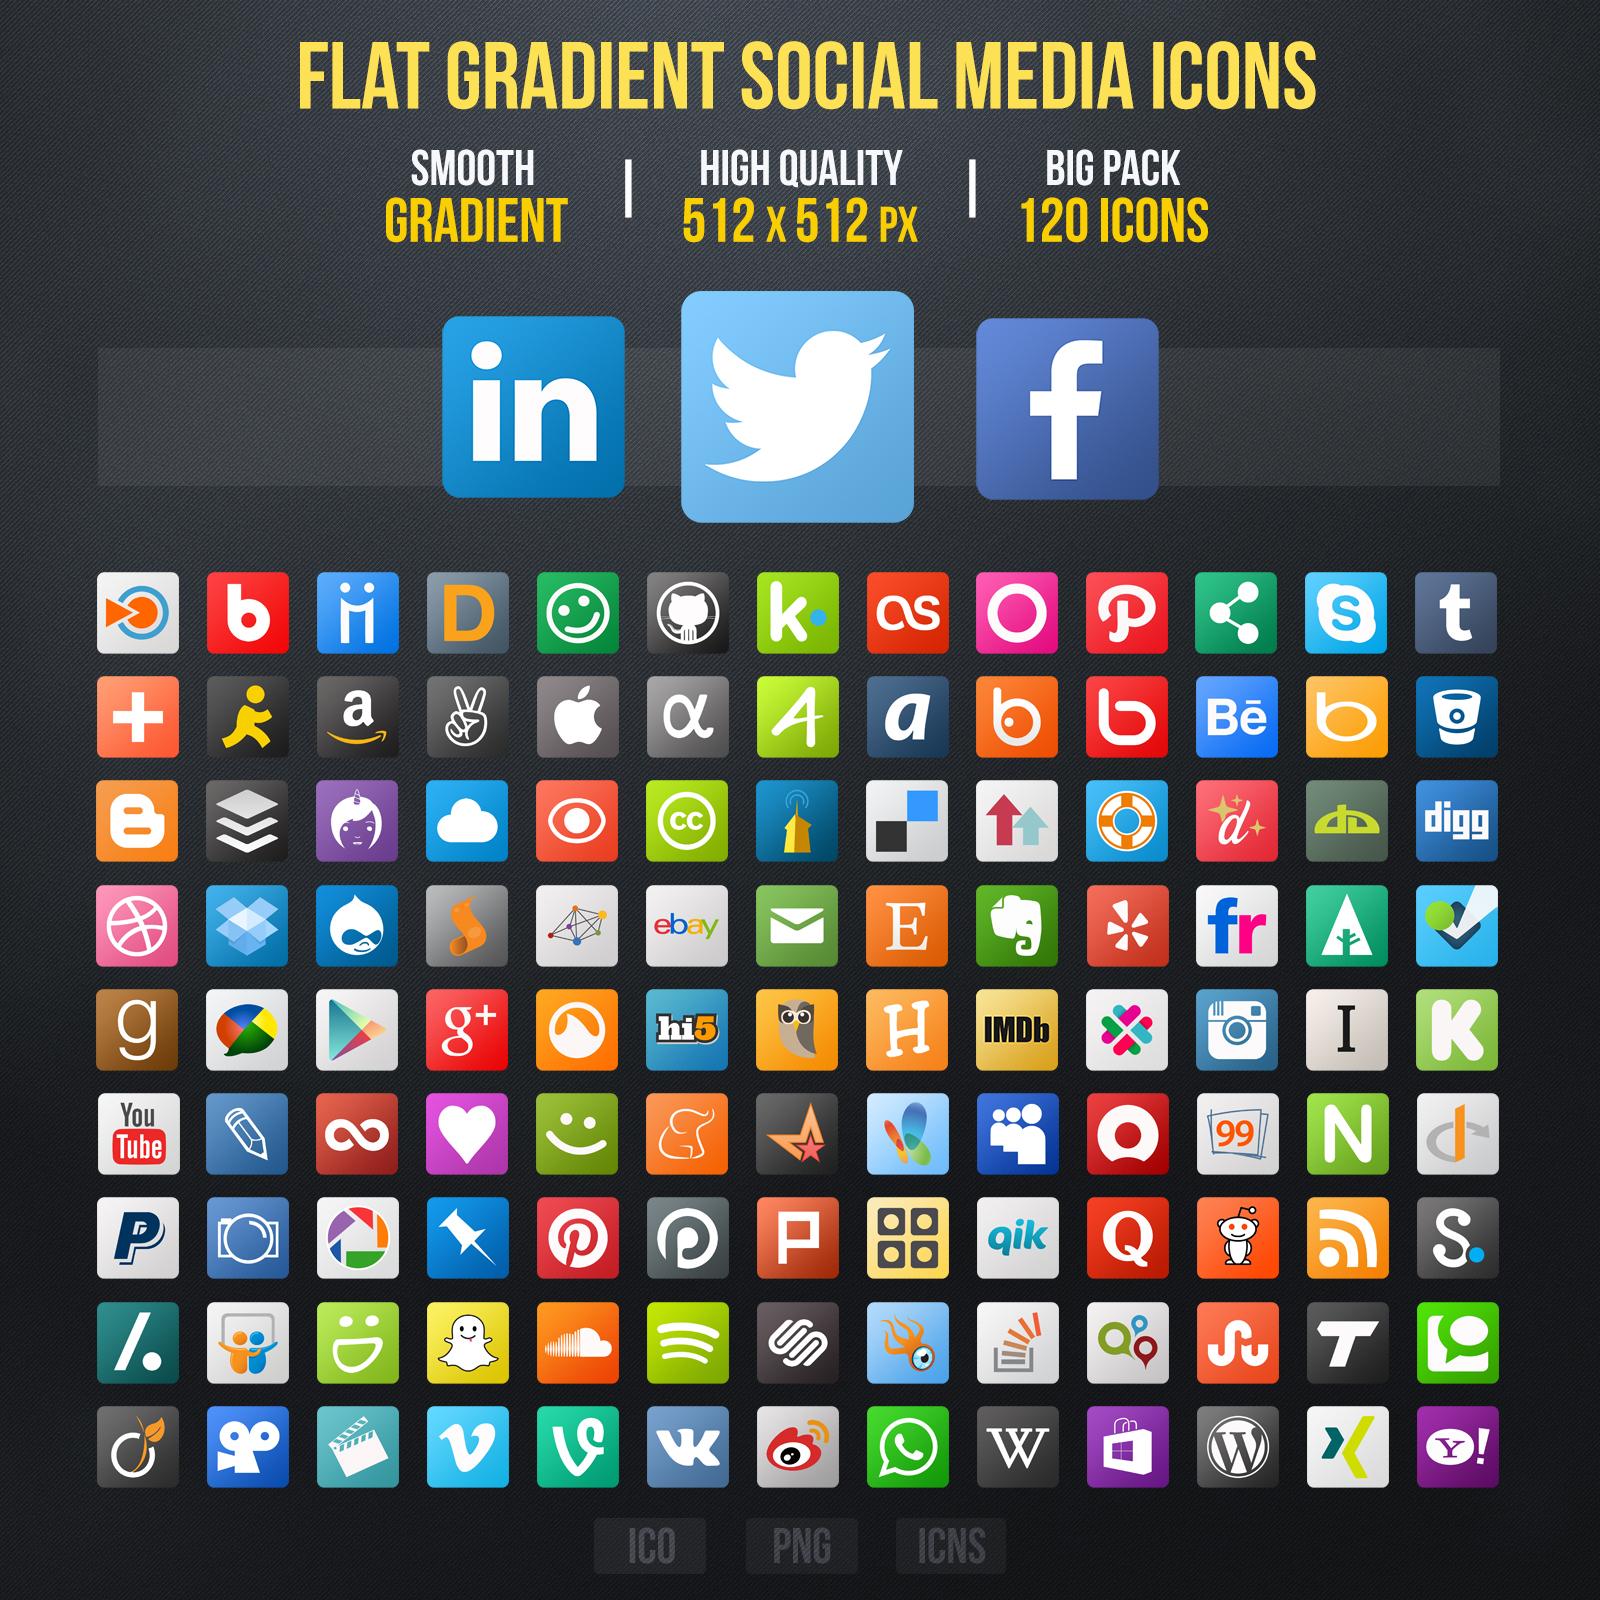 Flat Gradient Social Media Icons by limav